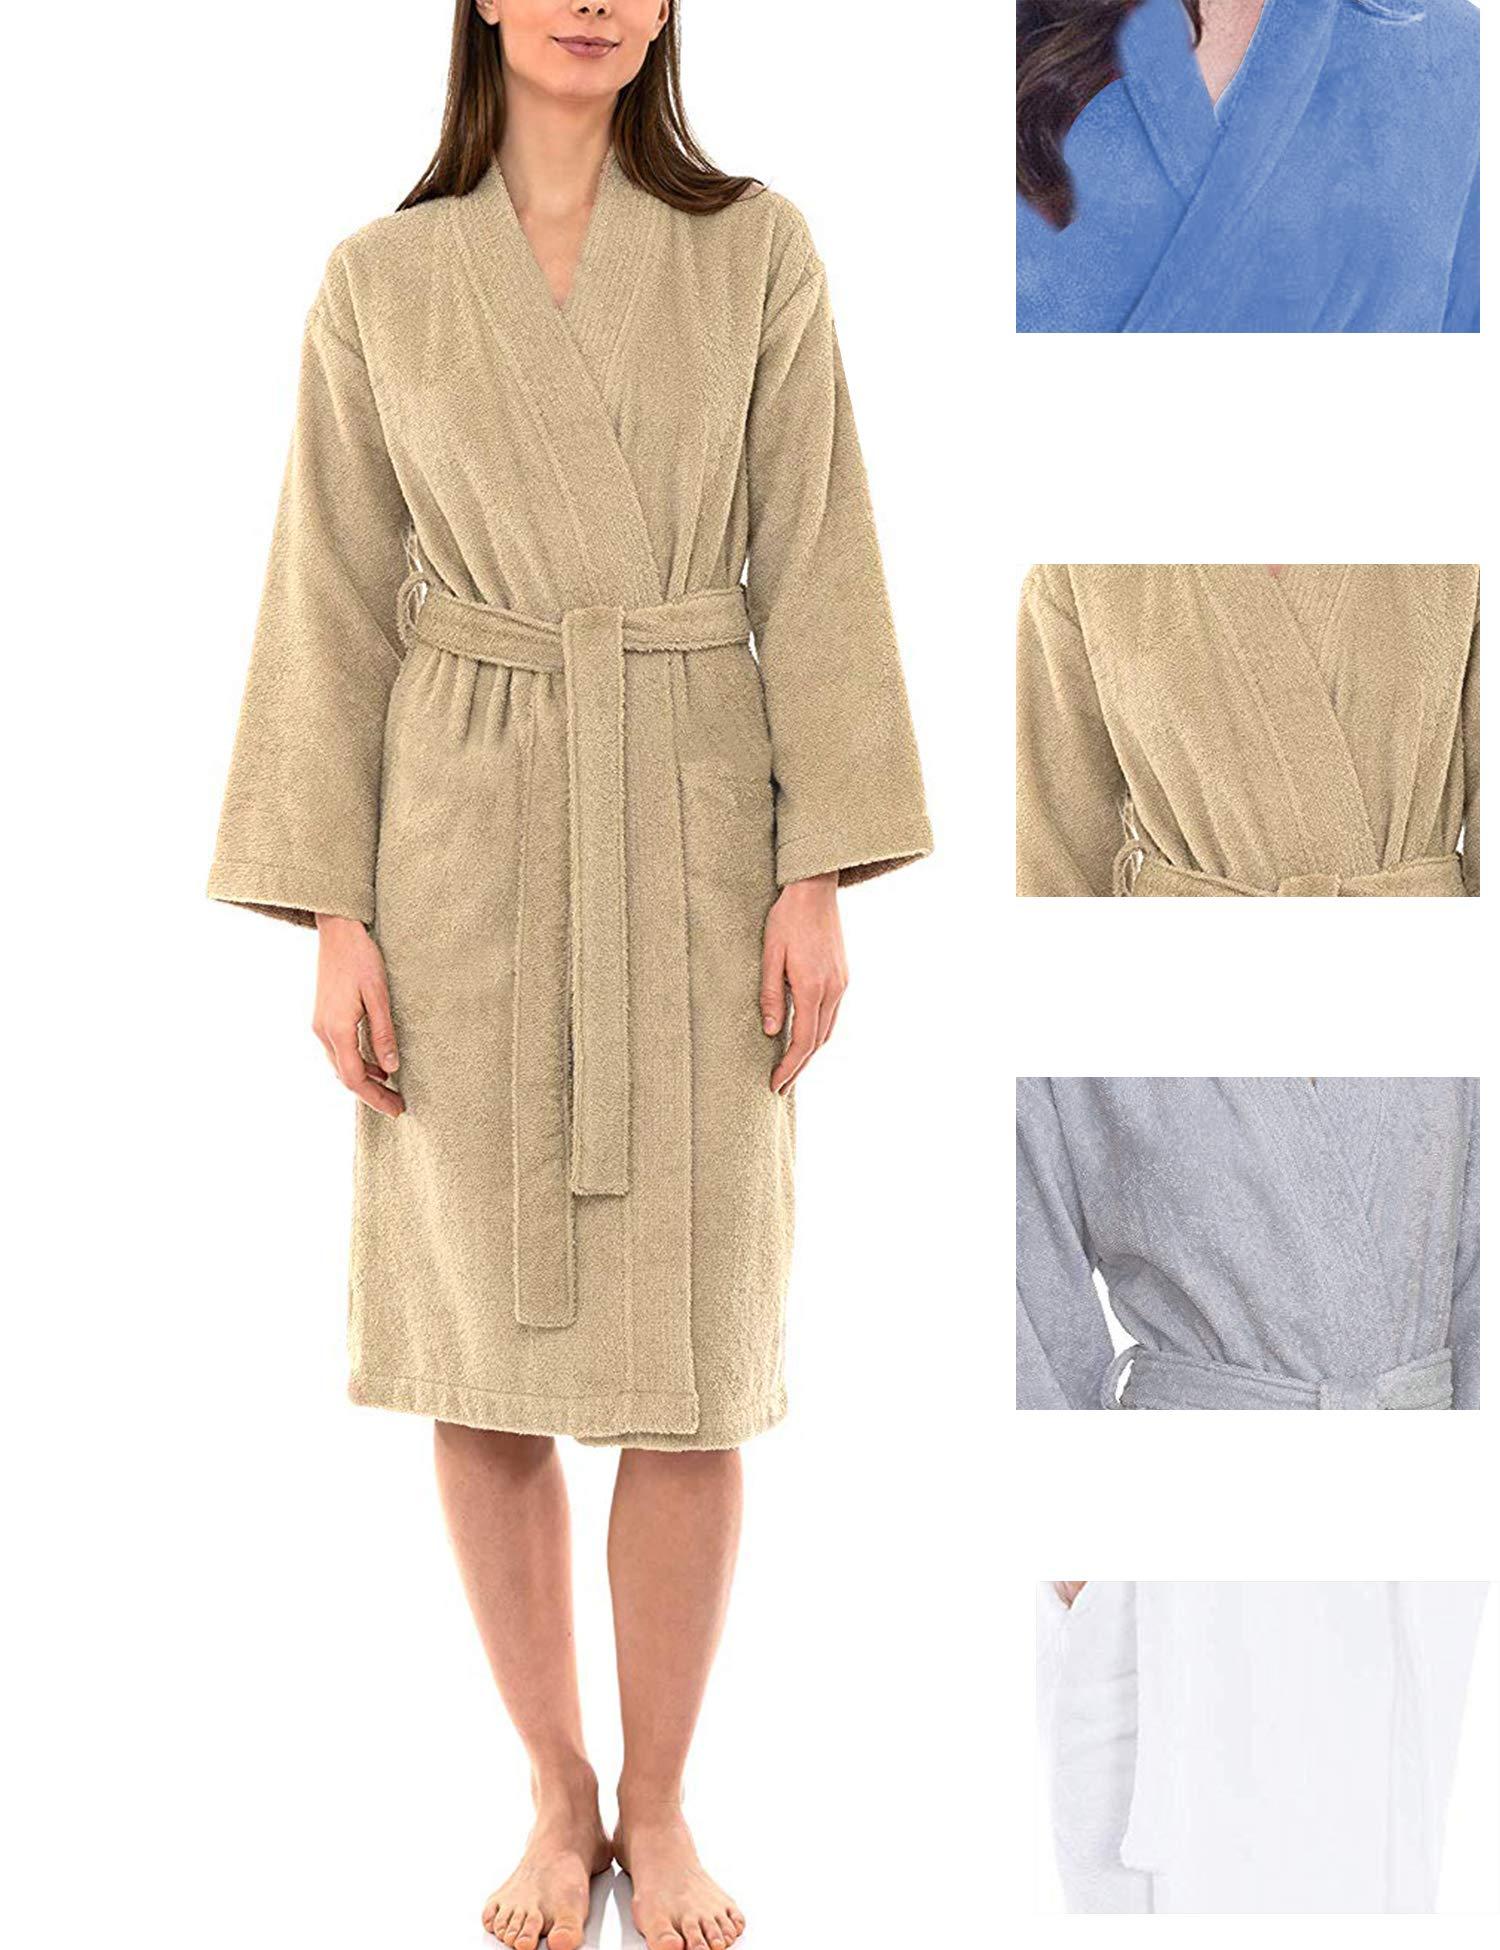 wearella Bathrobe Kimono Robes Cotton Lightweight Long Robe Knit Bathrobe Soft Sleepwear Womens Loungewear S-XXL